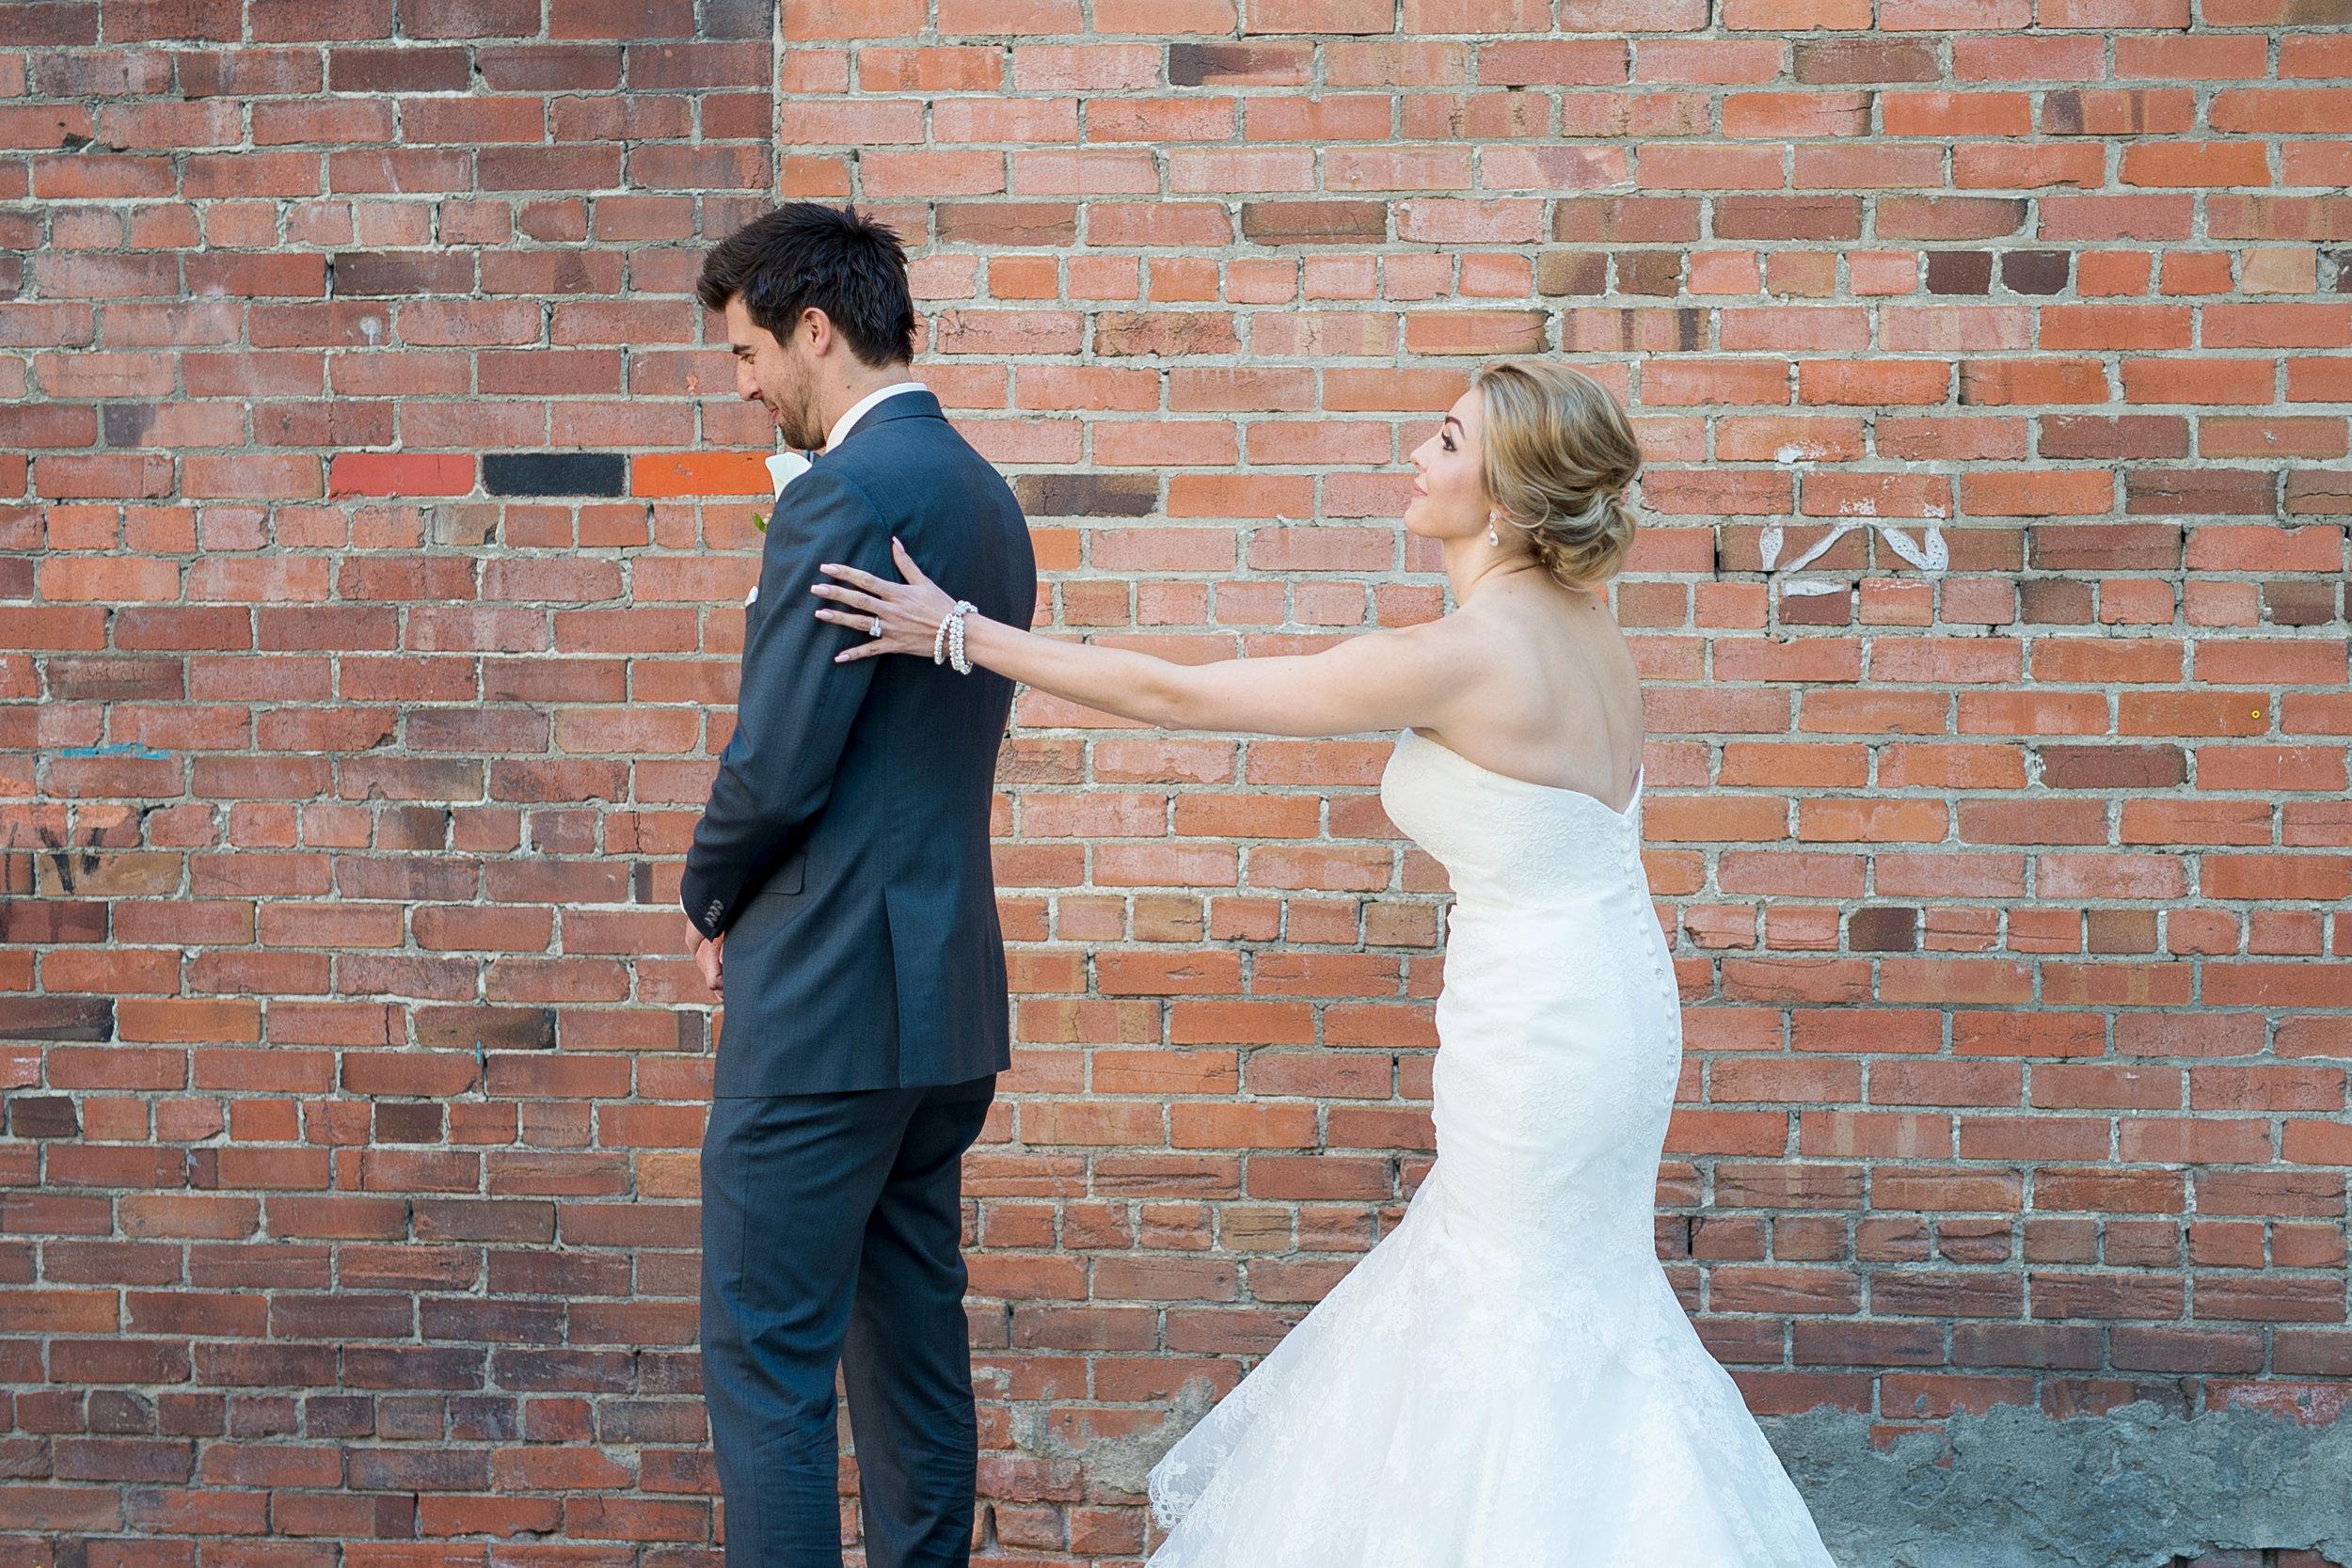 Calgary_Wedding_Photographer_Sanja_Scott_2016_HR 0188.jpg